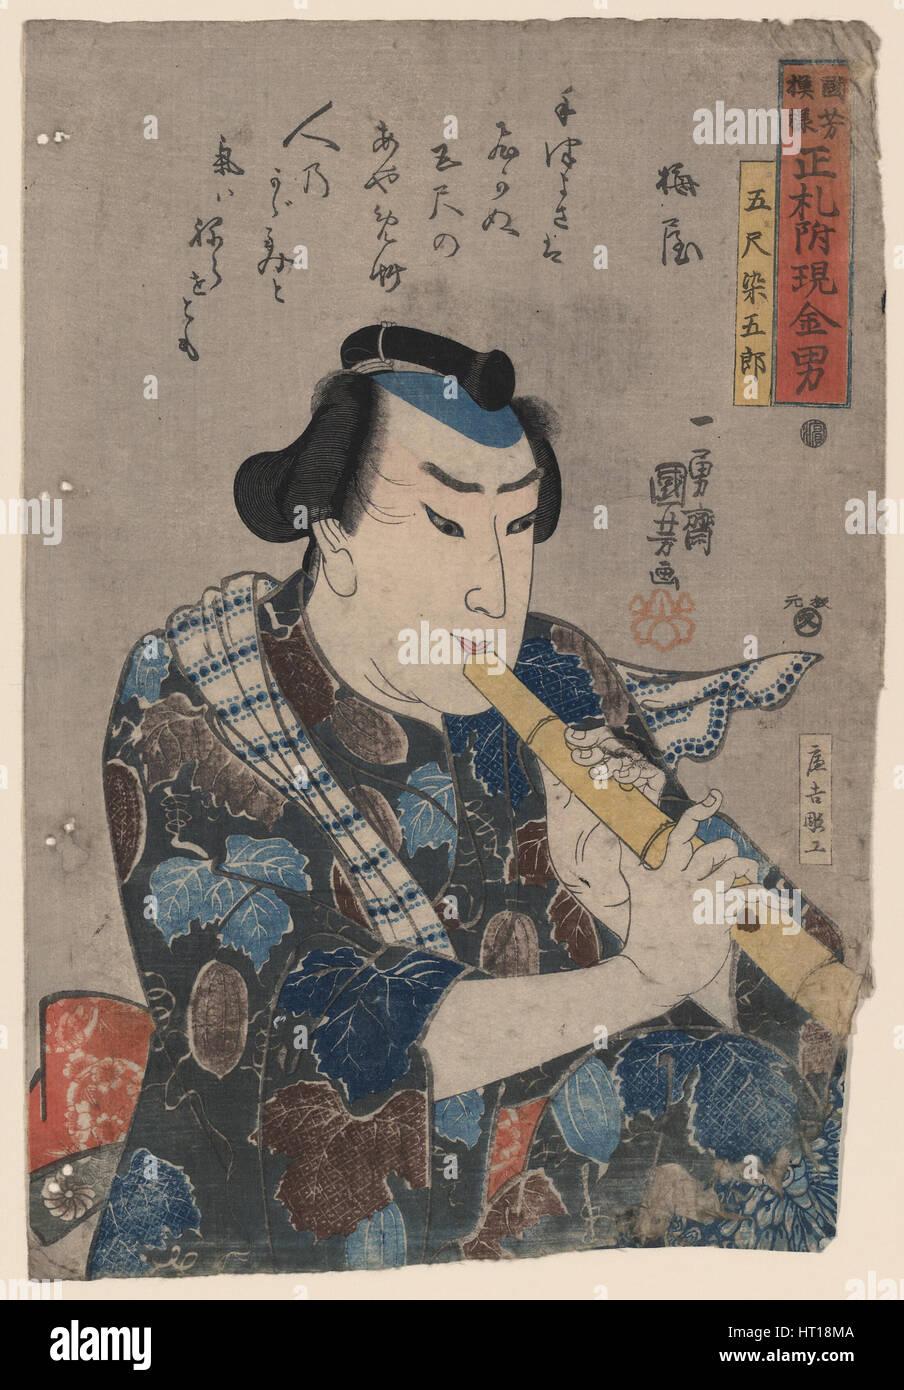 Shakuhachi Player. Artist: Kuniyoshi, Utagawa (1797-1861) - Stock Image